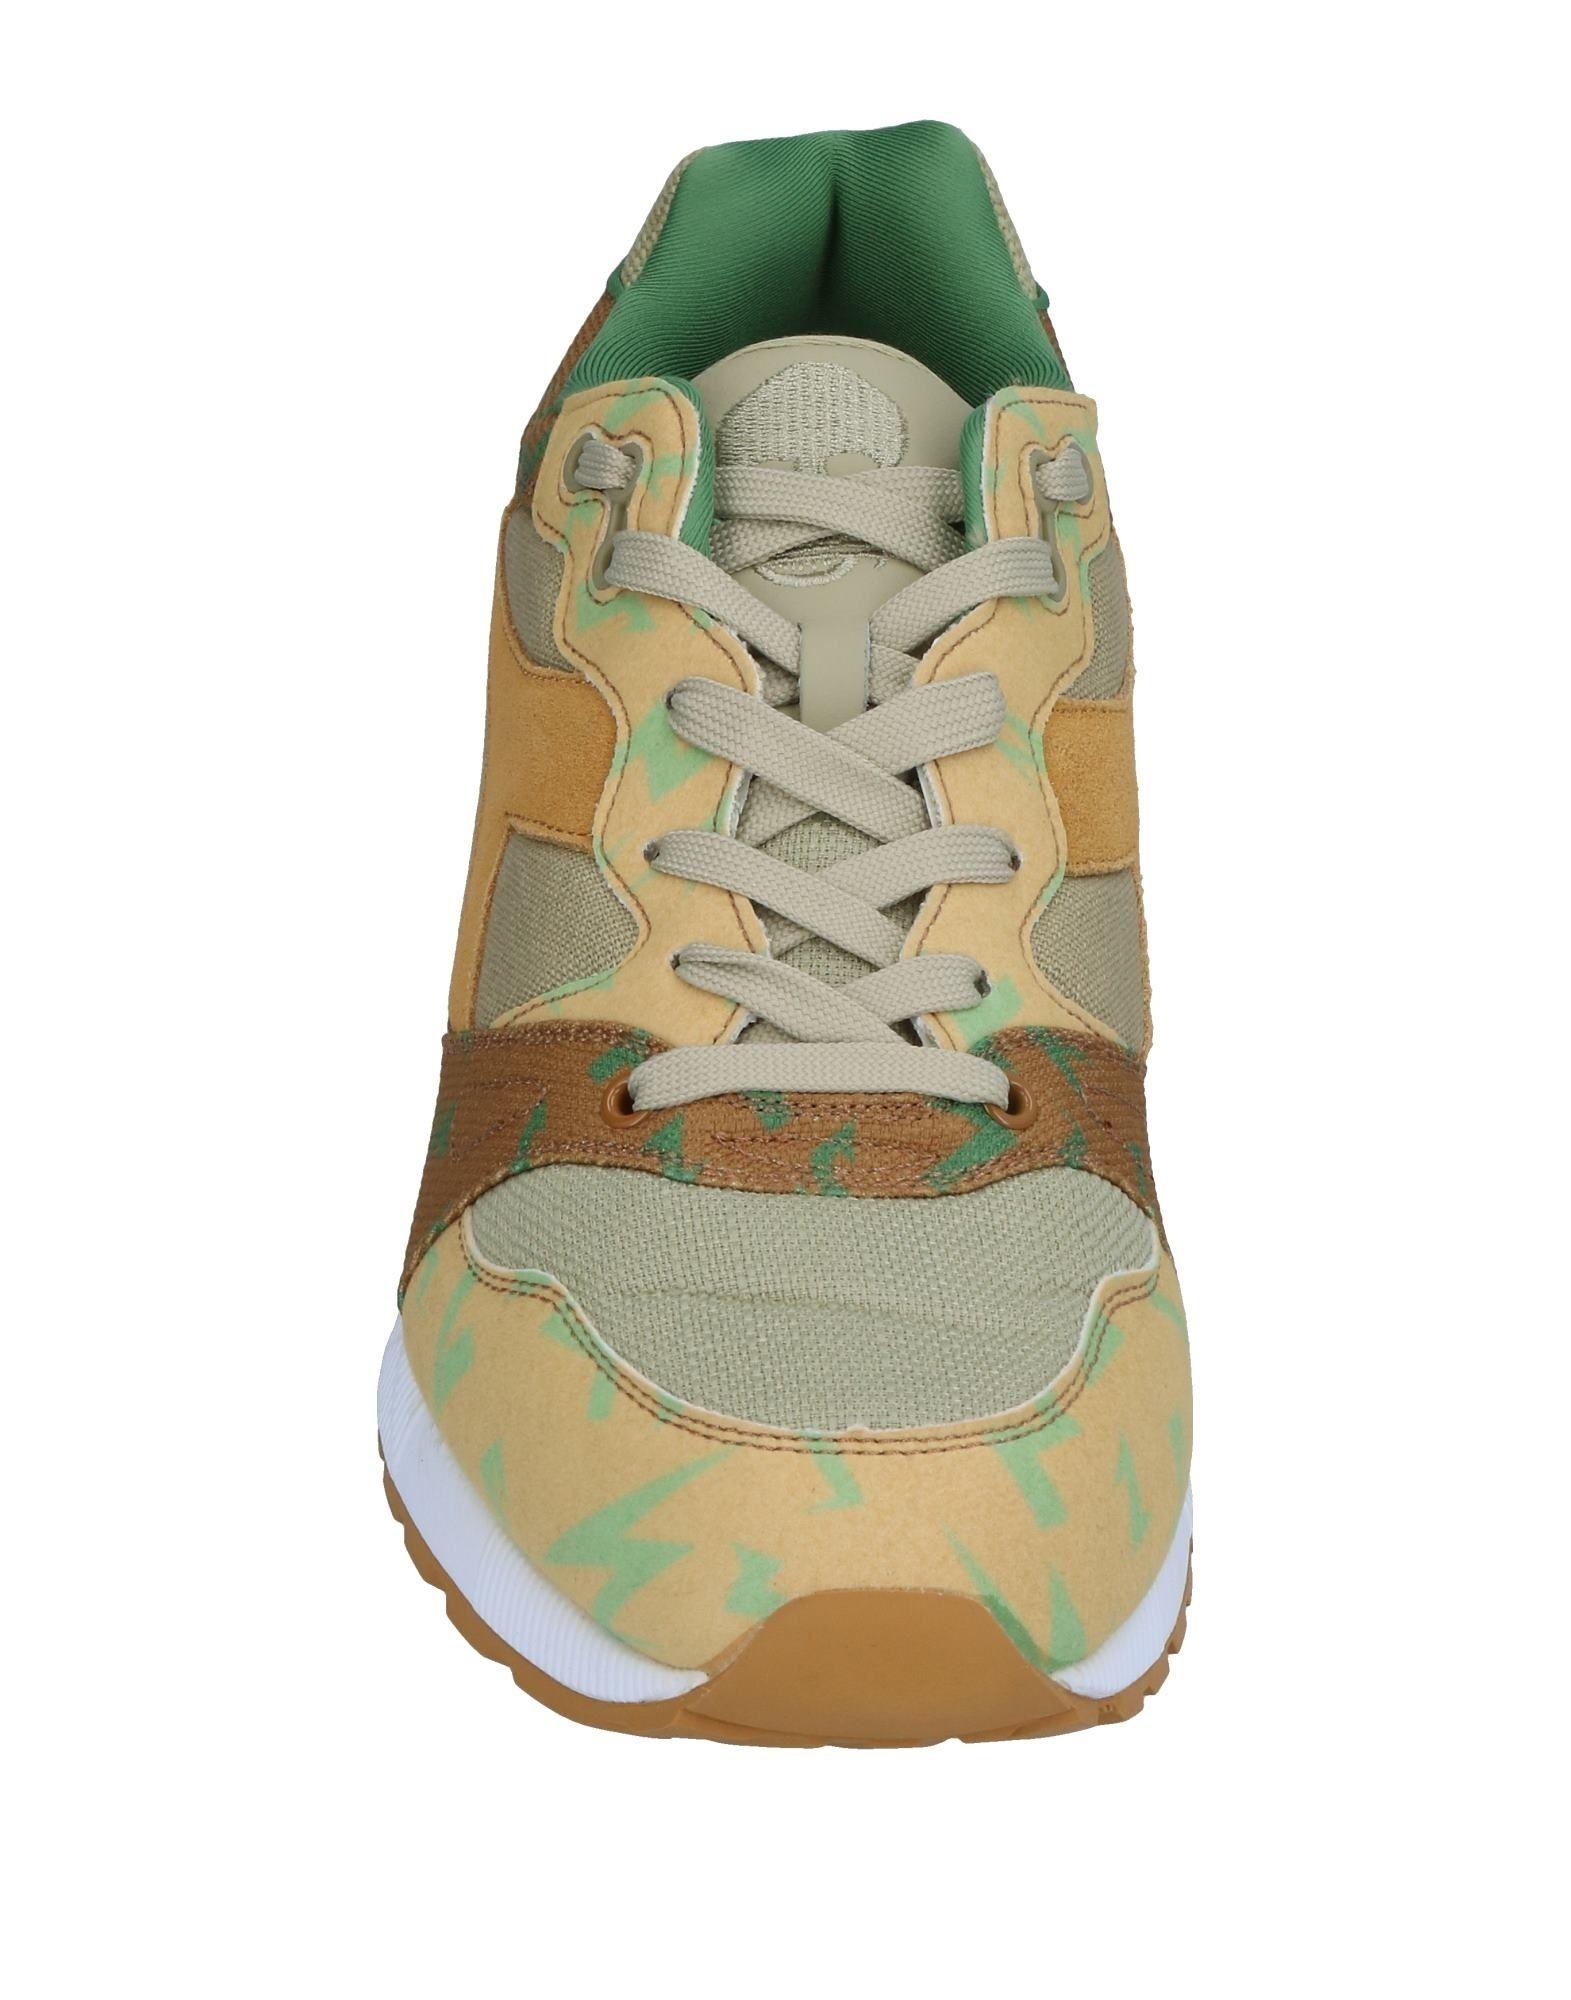 Diadora Sneakers online - Men Diadora Sneakers online Sneakers on  Australia - 11382688UC a77899